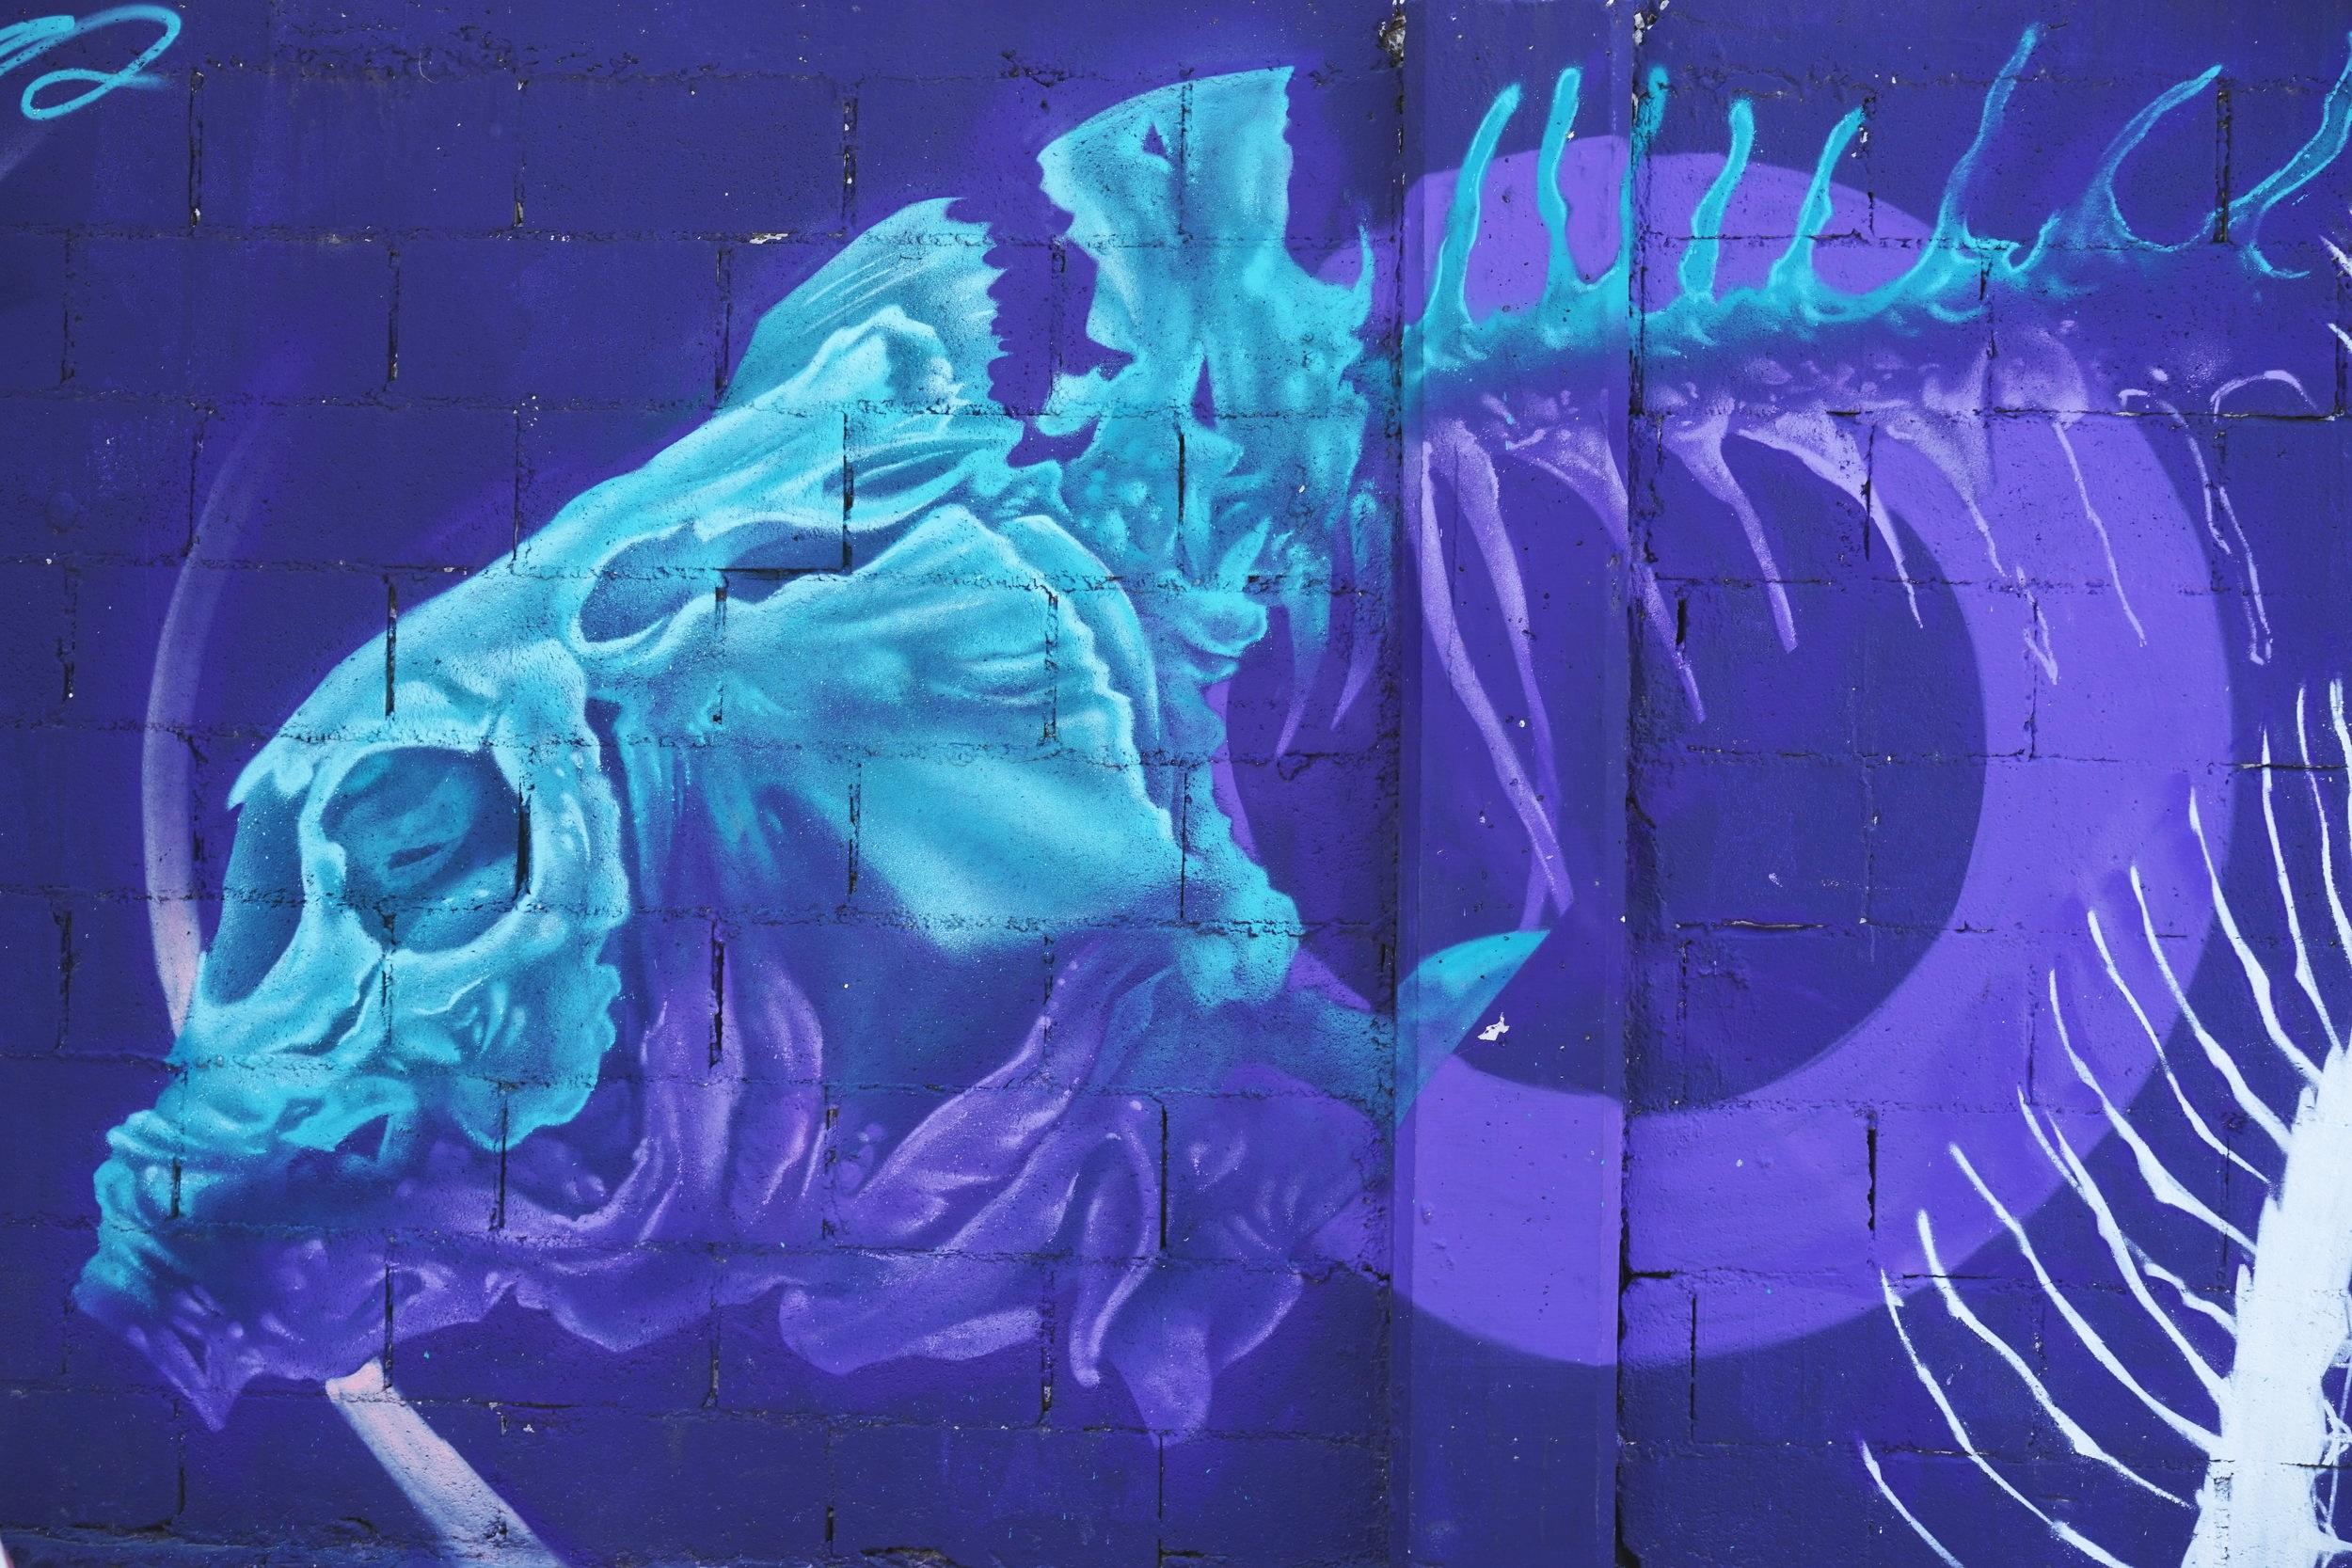 Artist Franc Mun